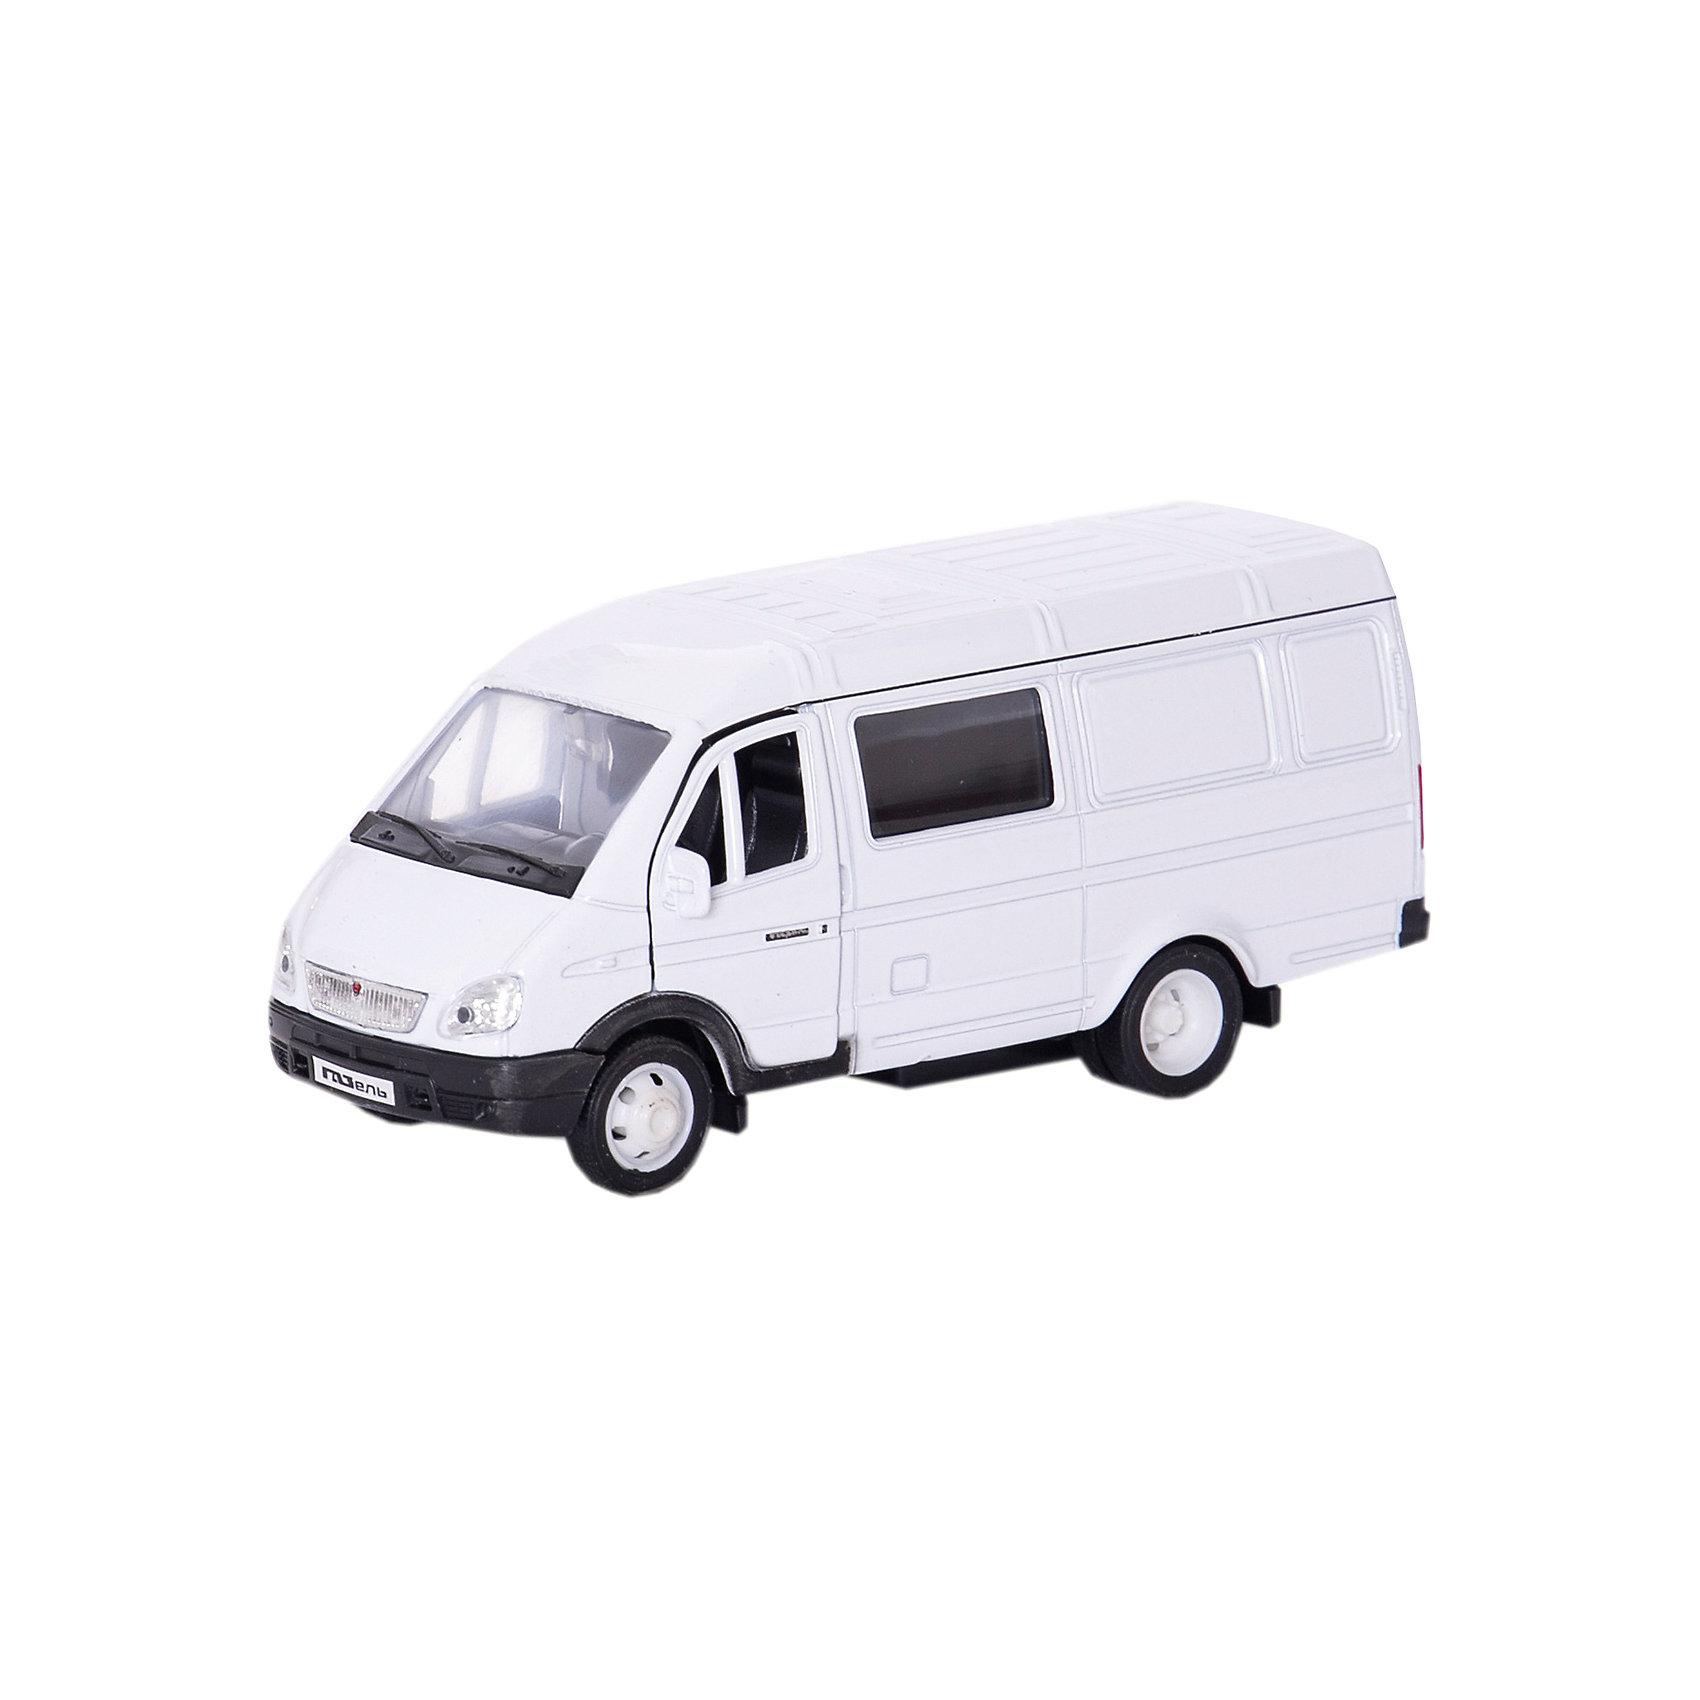 Welly Welly Модель машины ГАЗель фургон с окном машинки welly игрушка модель машины автокран